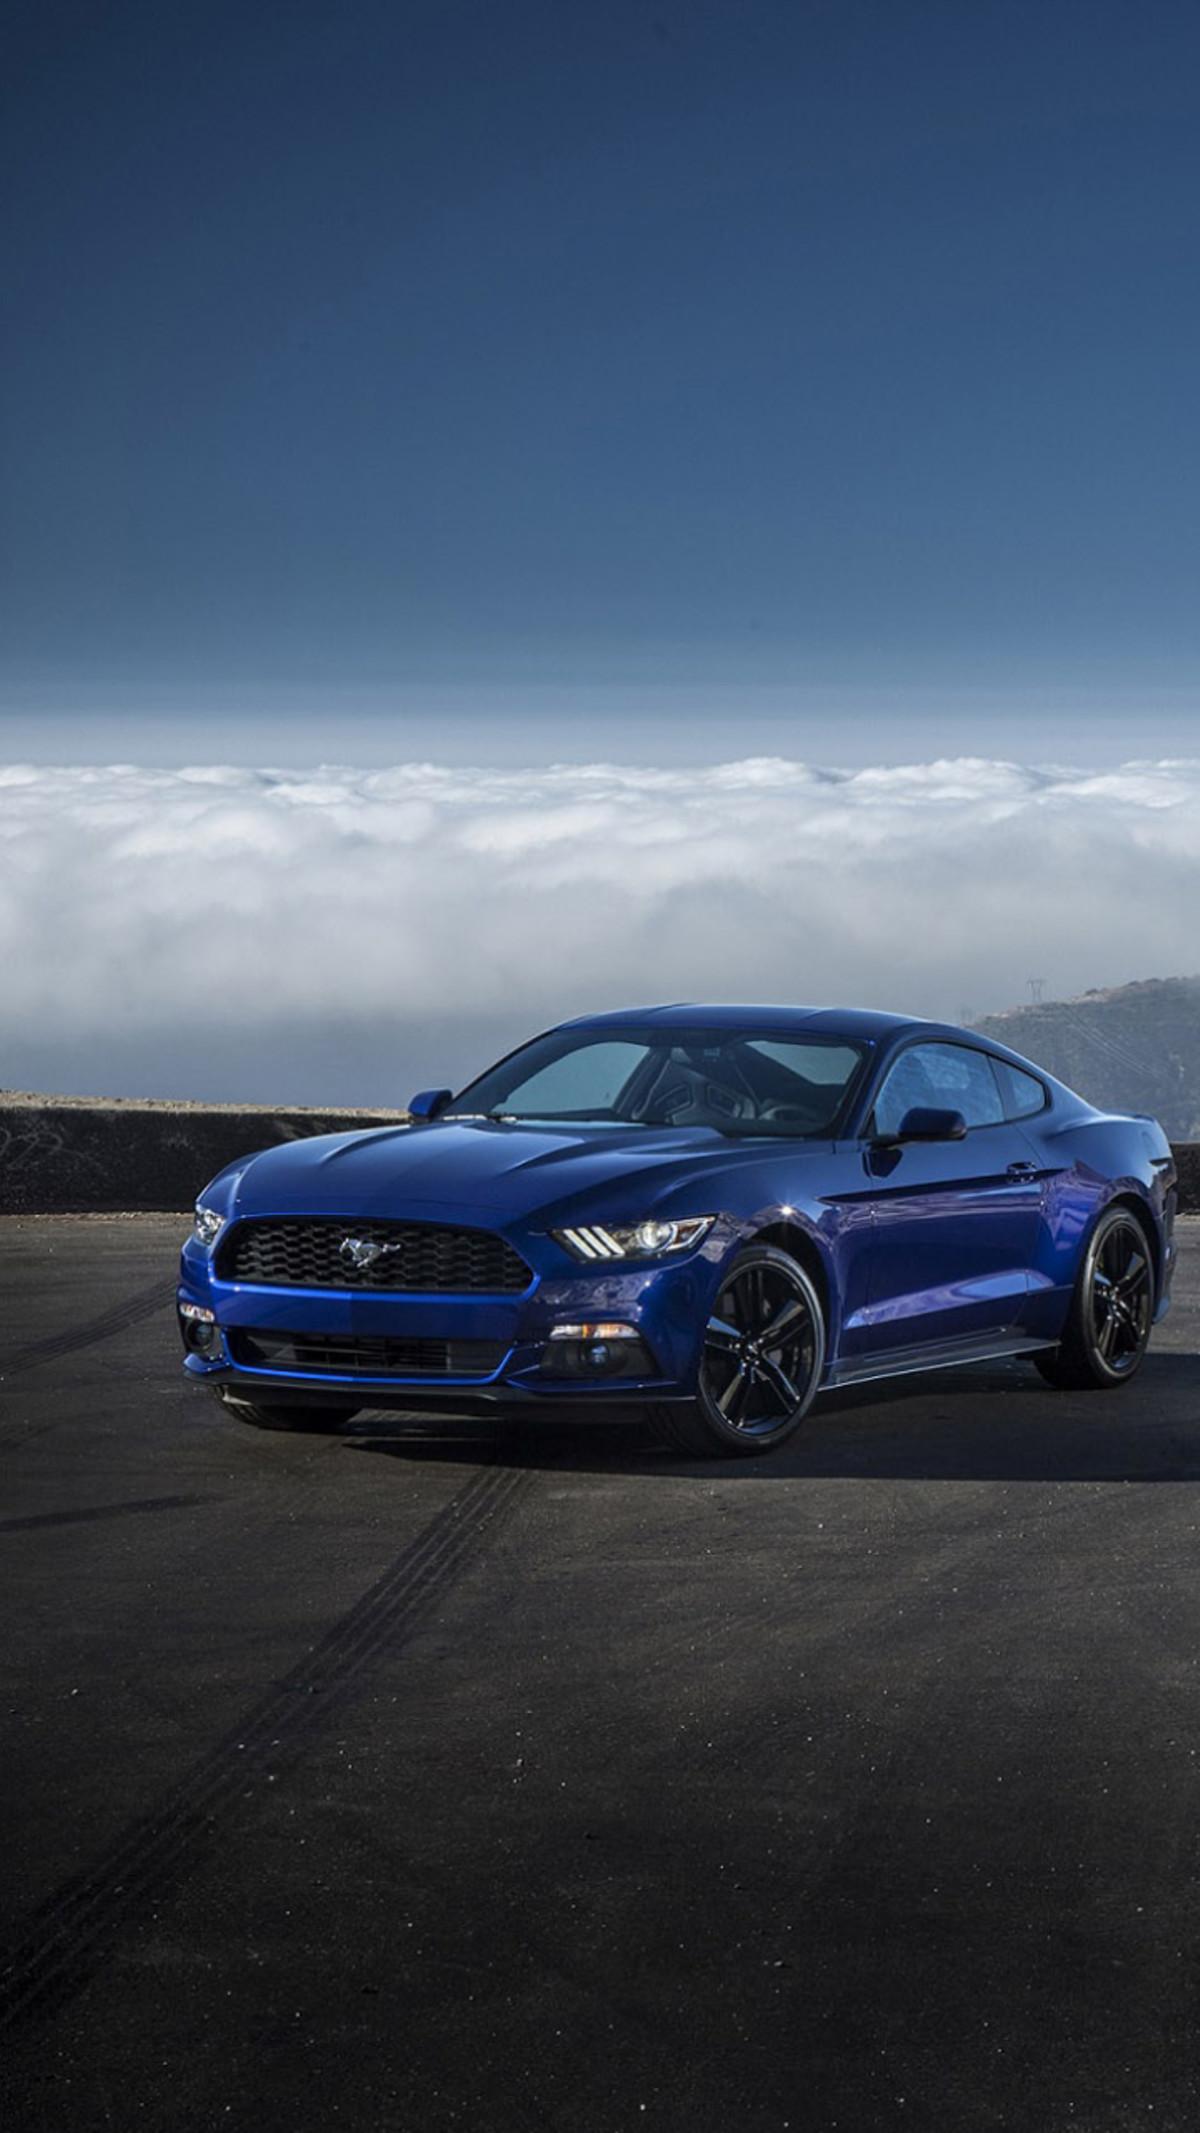 Ford Mustang Mustang Fondo De Pantalla Para Iphone 1200x2133 Wallpapertip